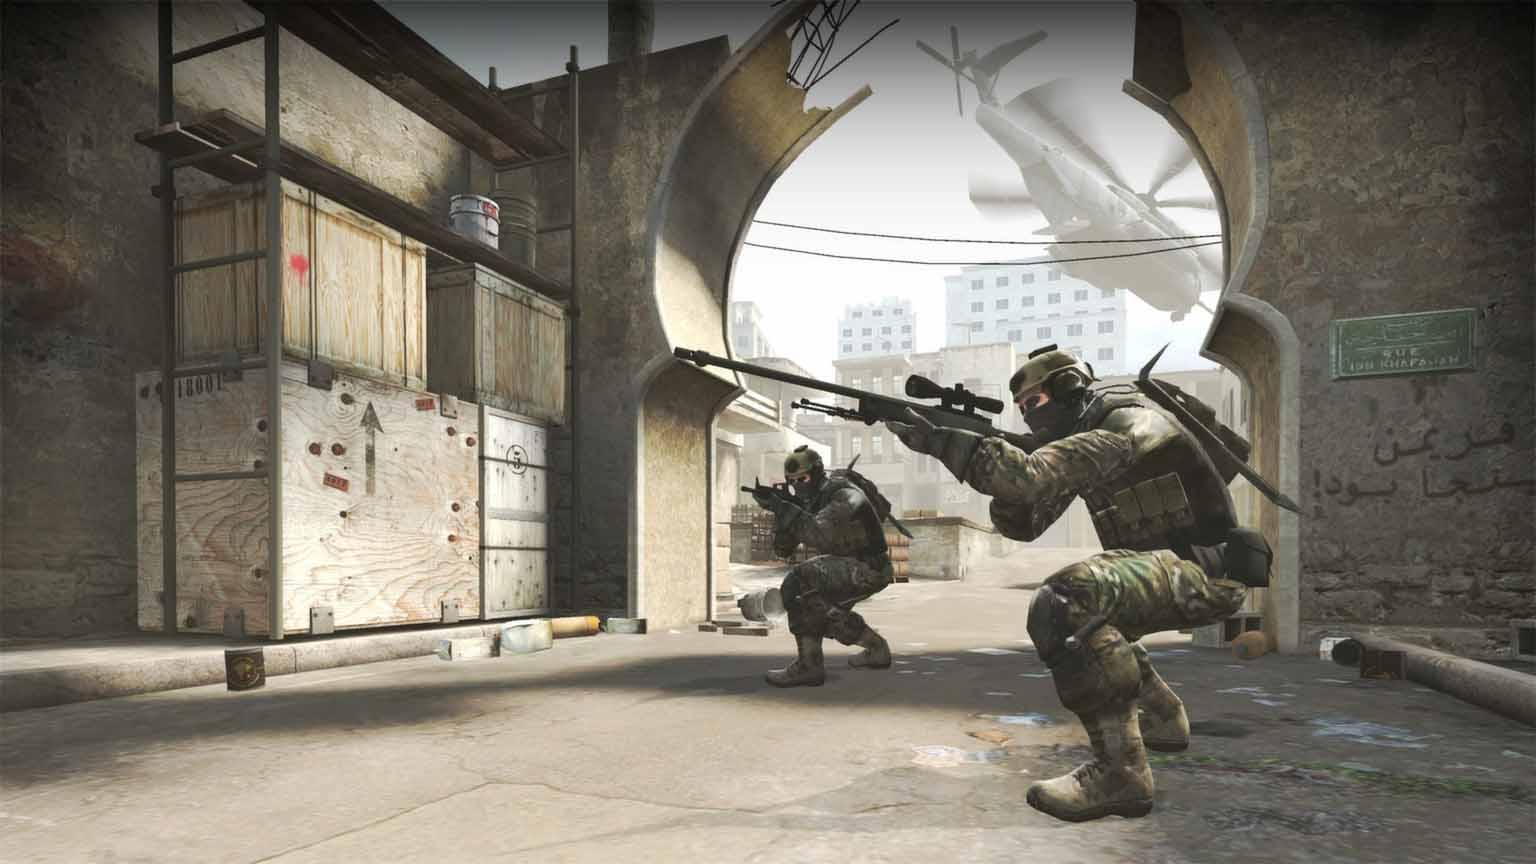 download-Counter-Strike-Global-Offensive-hadoan-tv-3